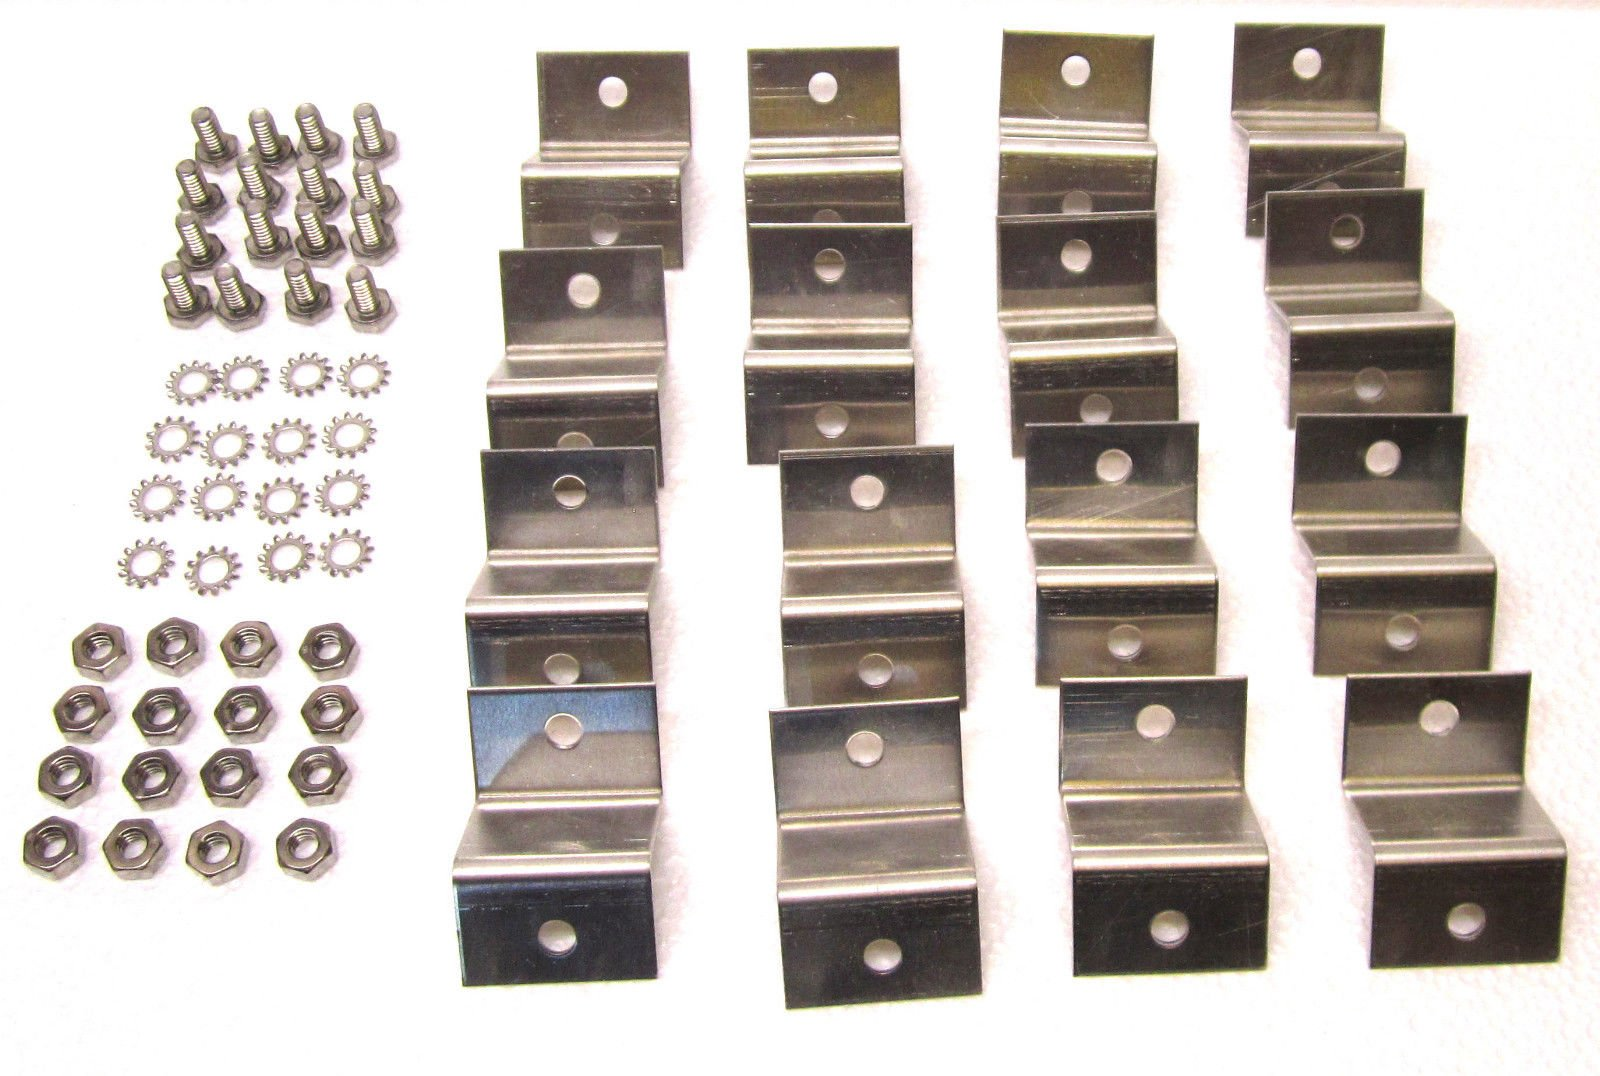 Solar Panel Z Bracket Mounting Kit (4 kits) USA